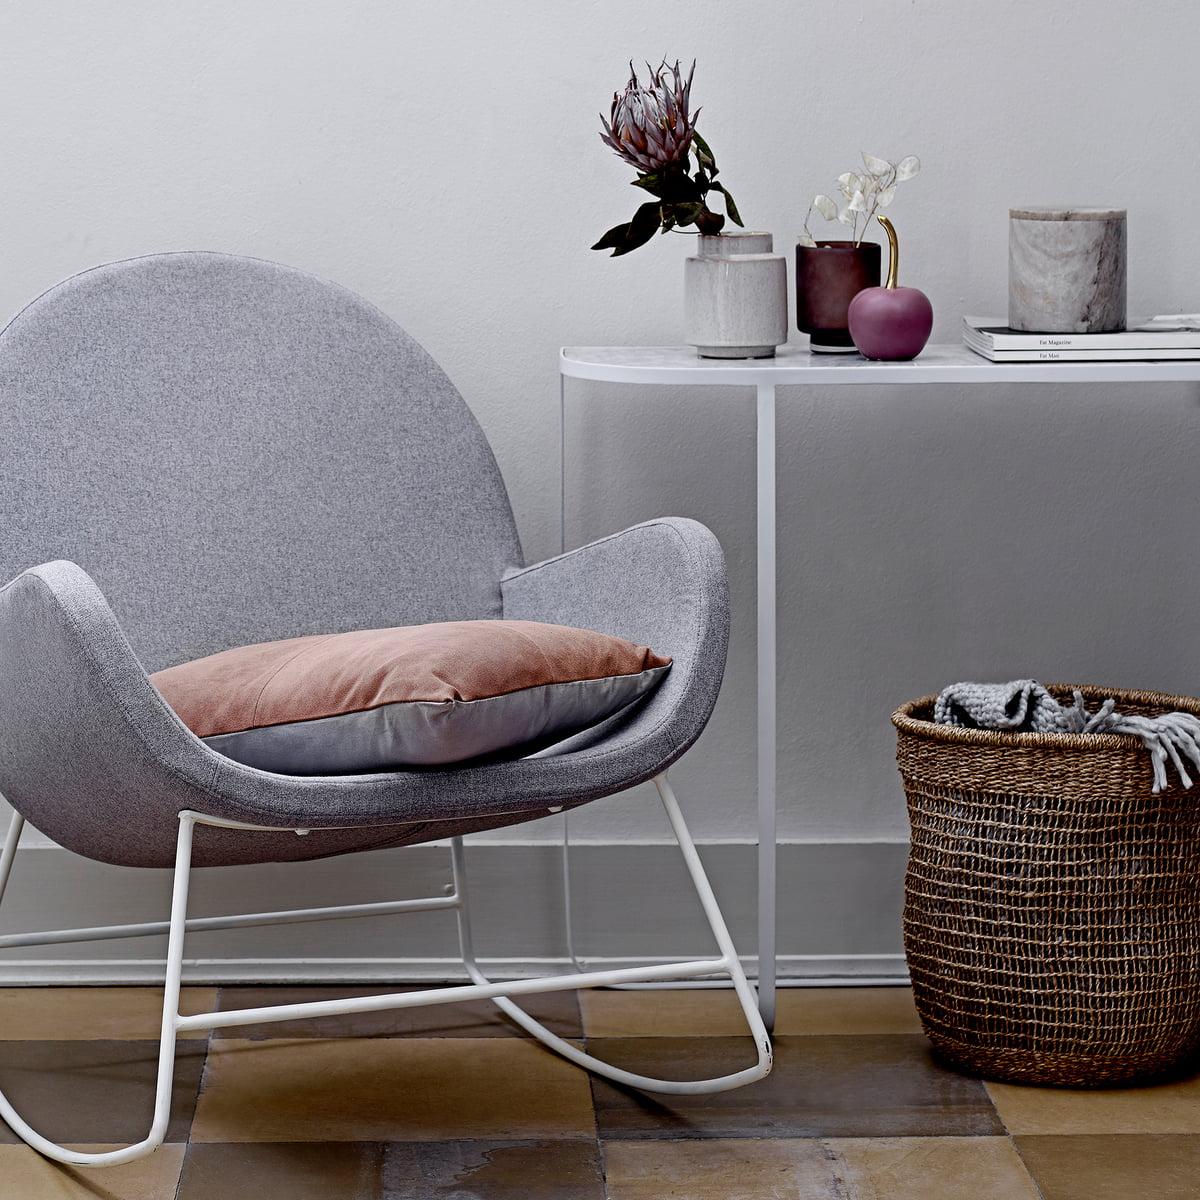 marmor dose von bloomingville. Black Bedroom Furniture Sets. Home Design Ideas